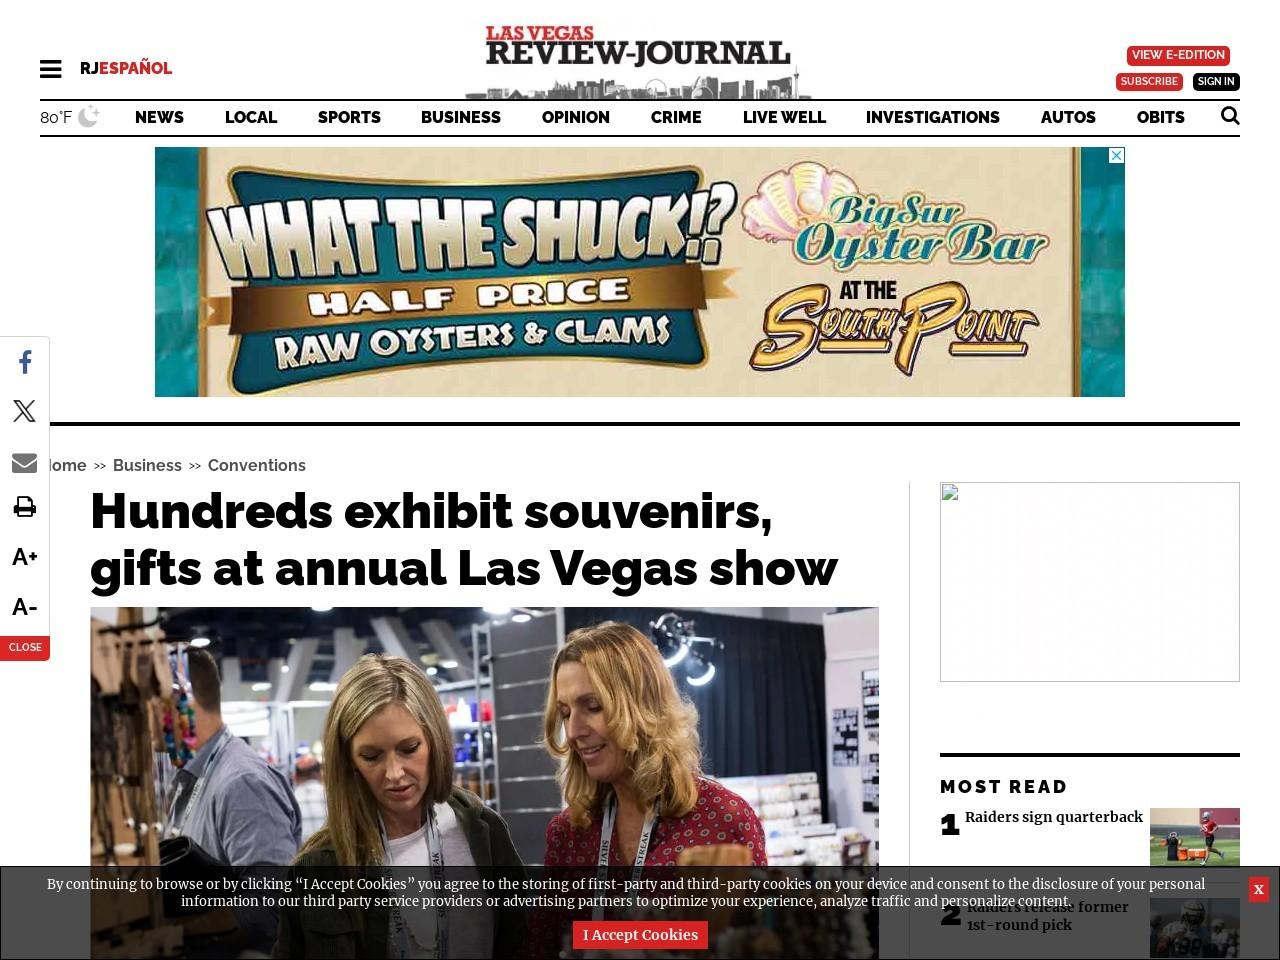 Hundreds exhibit souvenirs, gifts at annual Las Vegas show